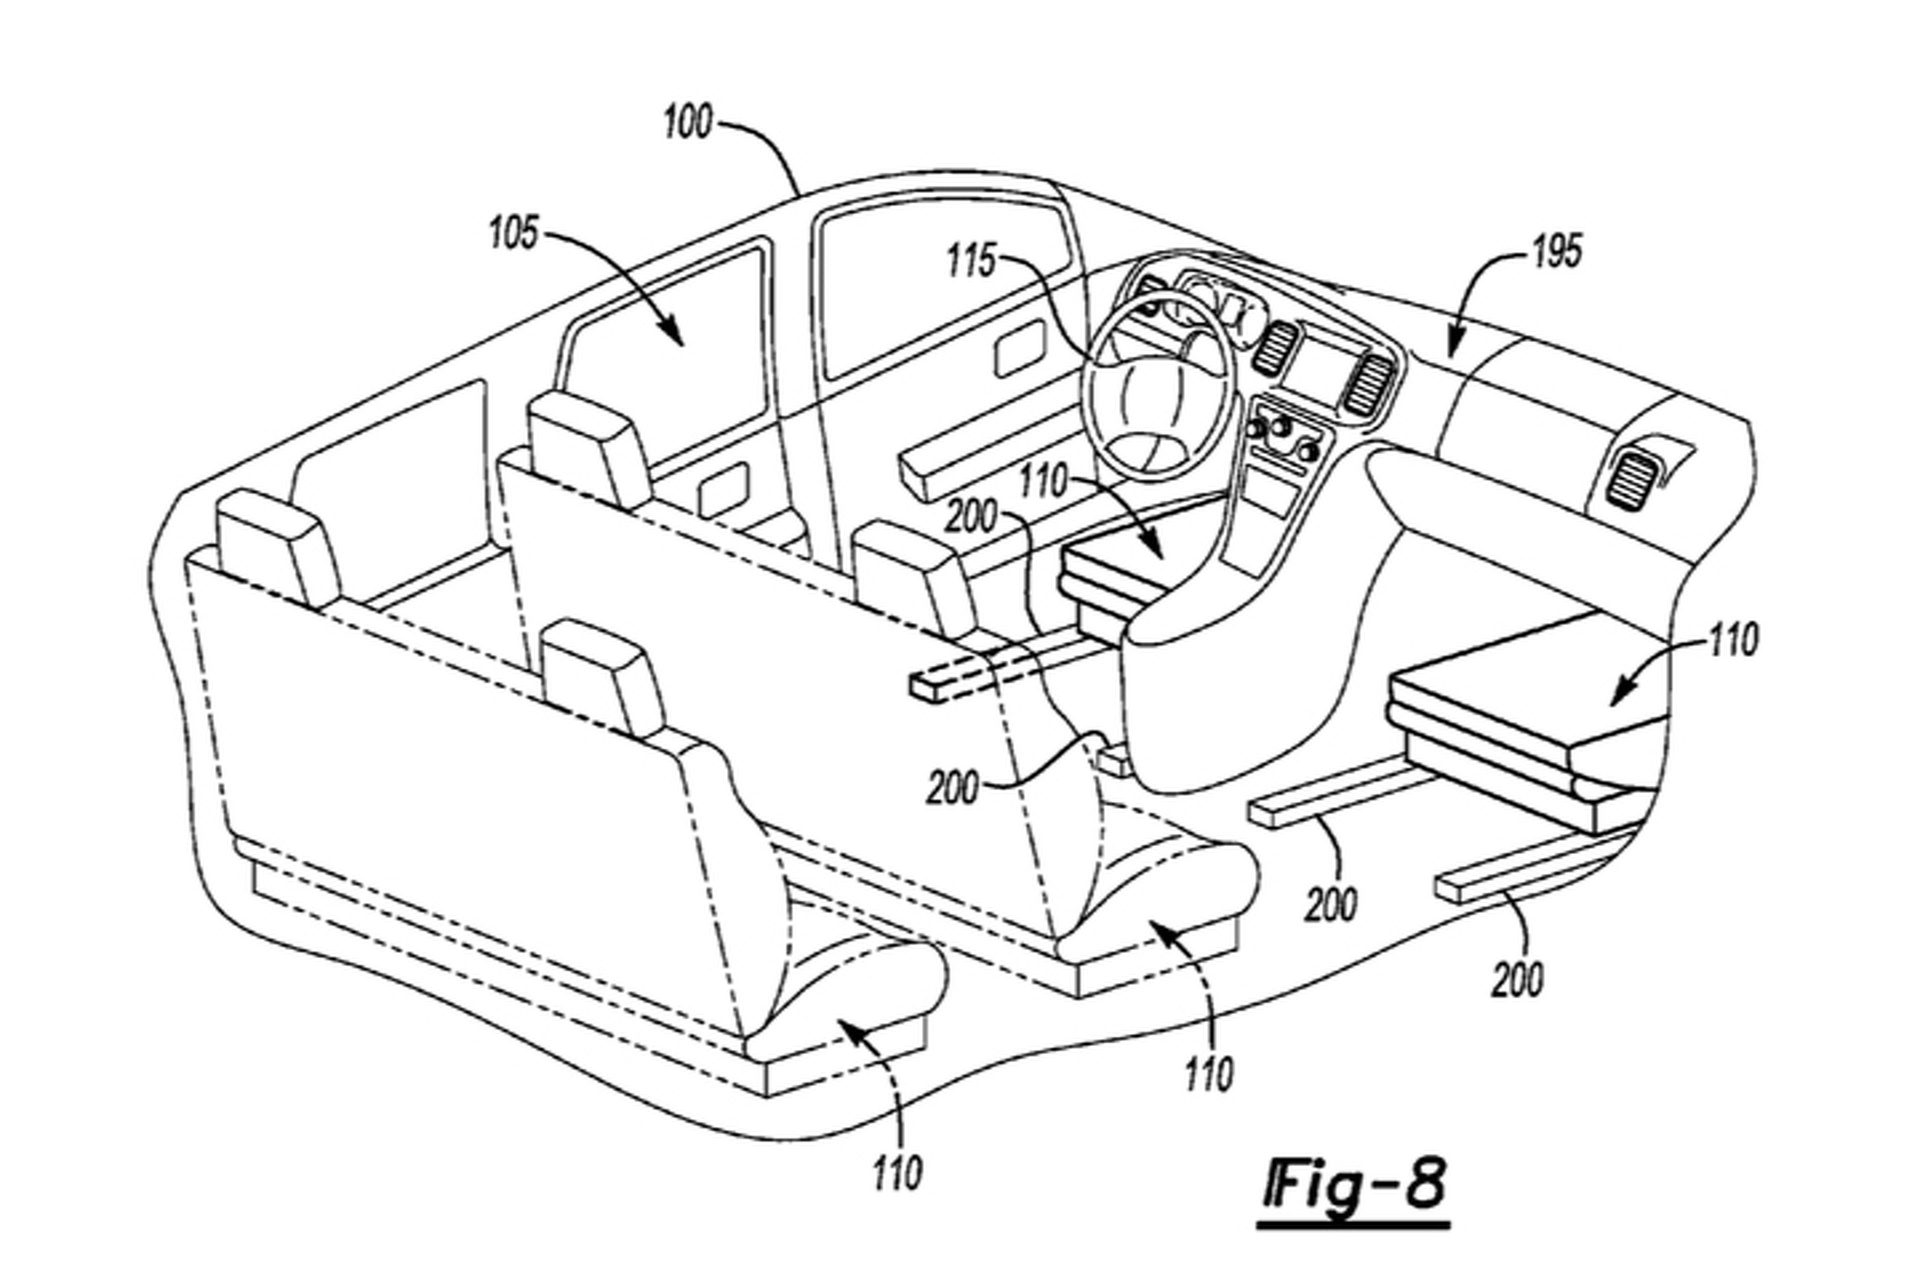 Intrior A Car Diagram Circuits Symbols Diagrams Ldv Maxus Central Locking Wiring New Ford Patent Reveals Shape Shifting Interior Rh Motor1 Com